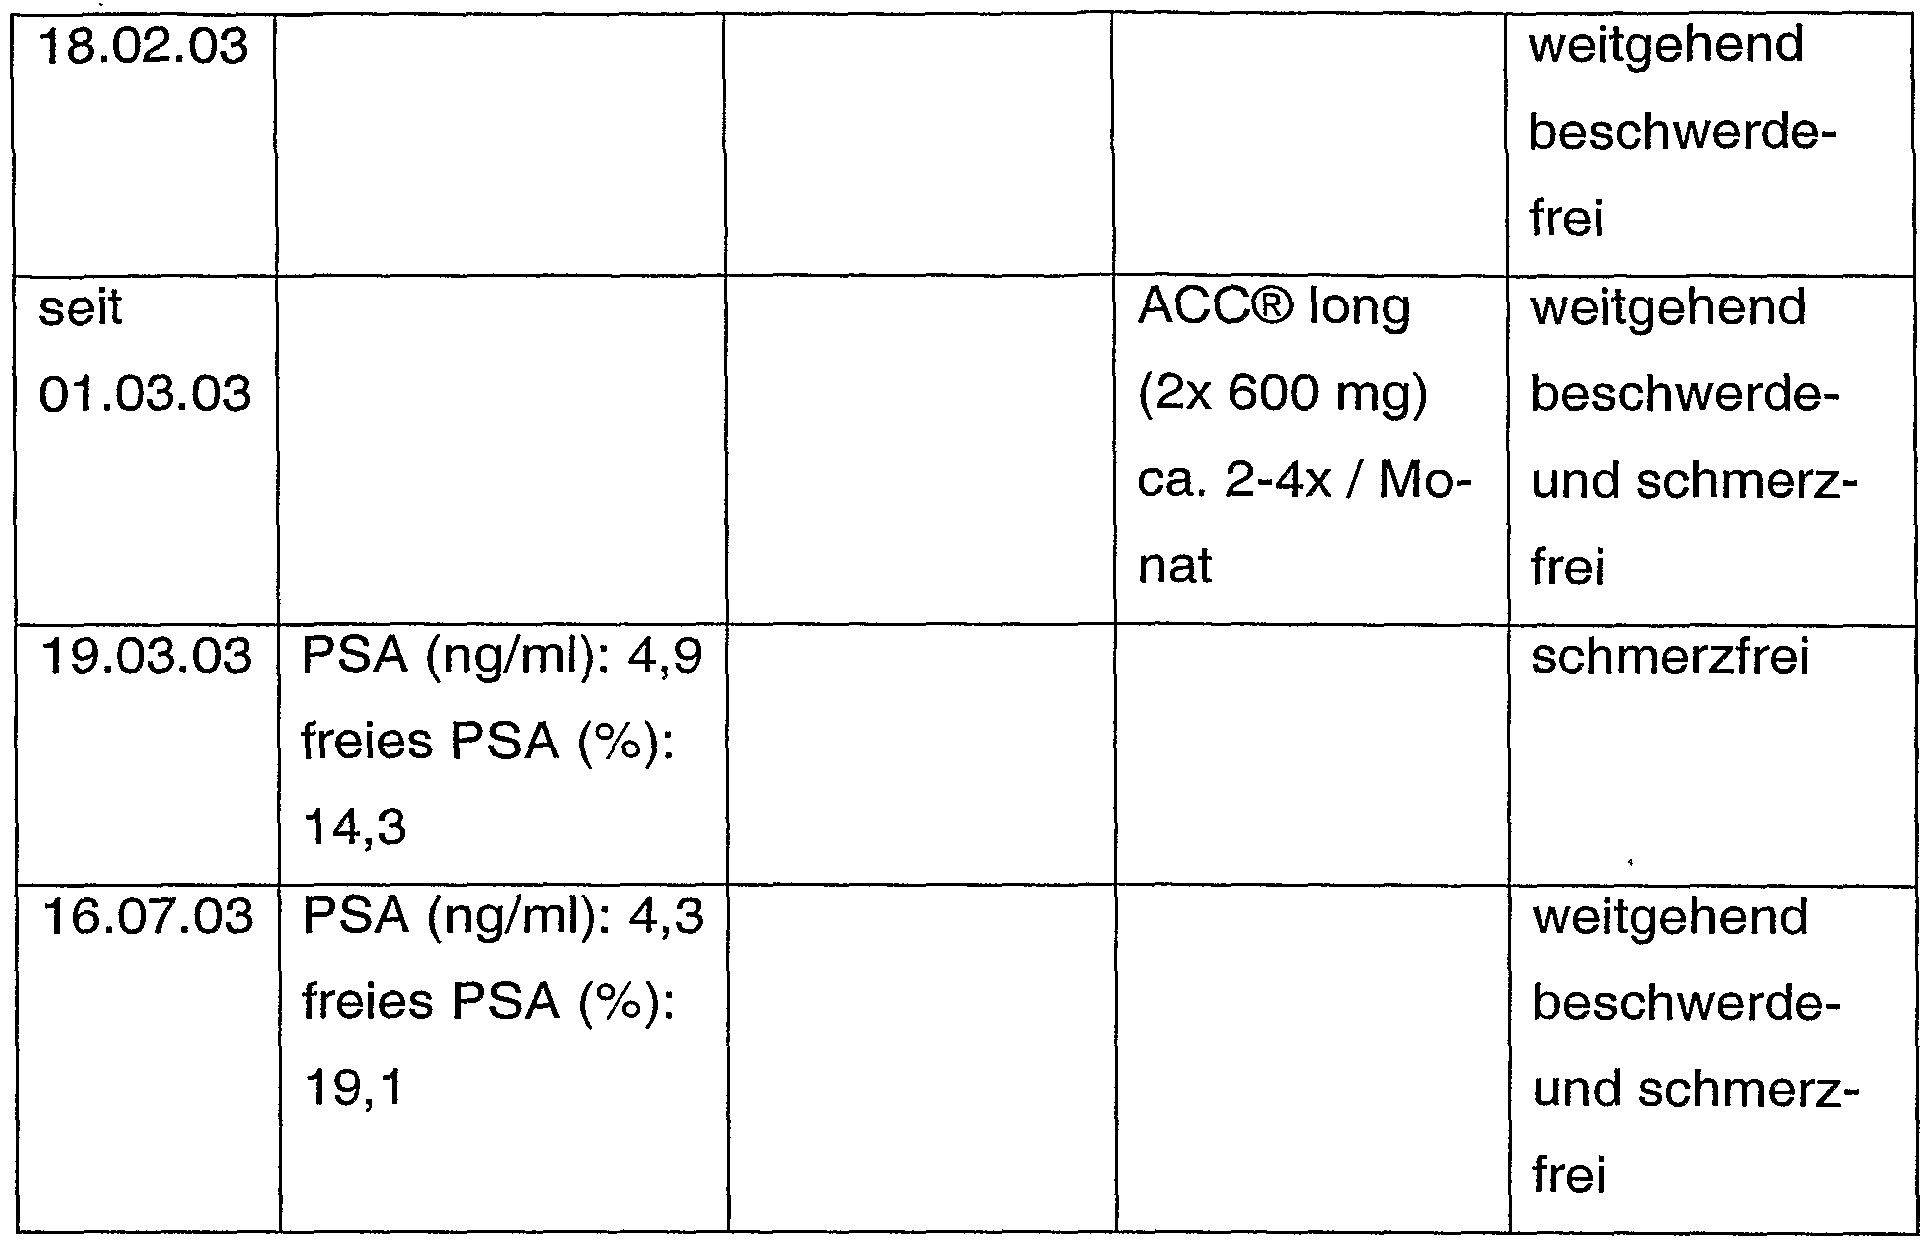 Antibiotikumok Scheme Prostatite Mi a krónikus prosztatitis visszhangjelei